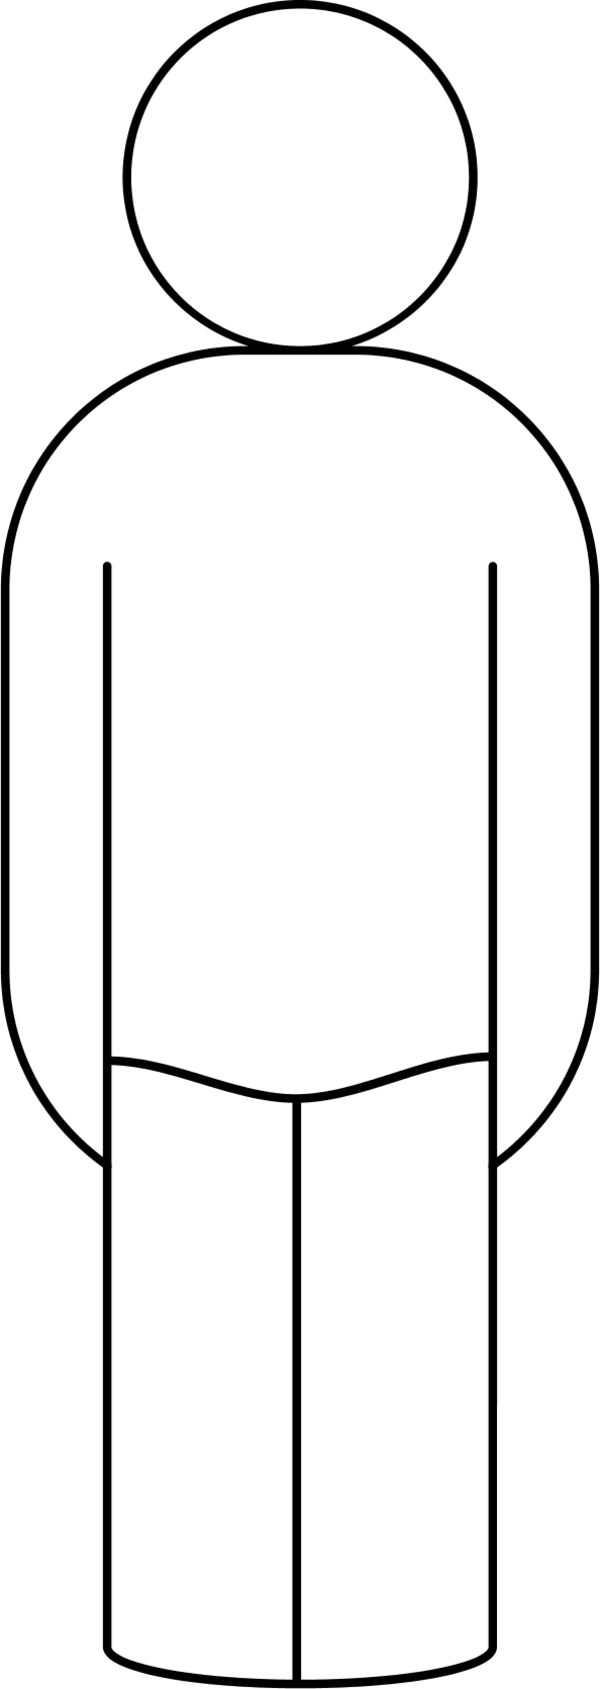 Clipart Person Outline Outline Vector Cl-Clipart Person Outline Outline Vector Clip Art-6